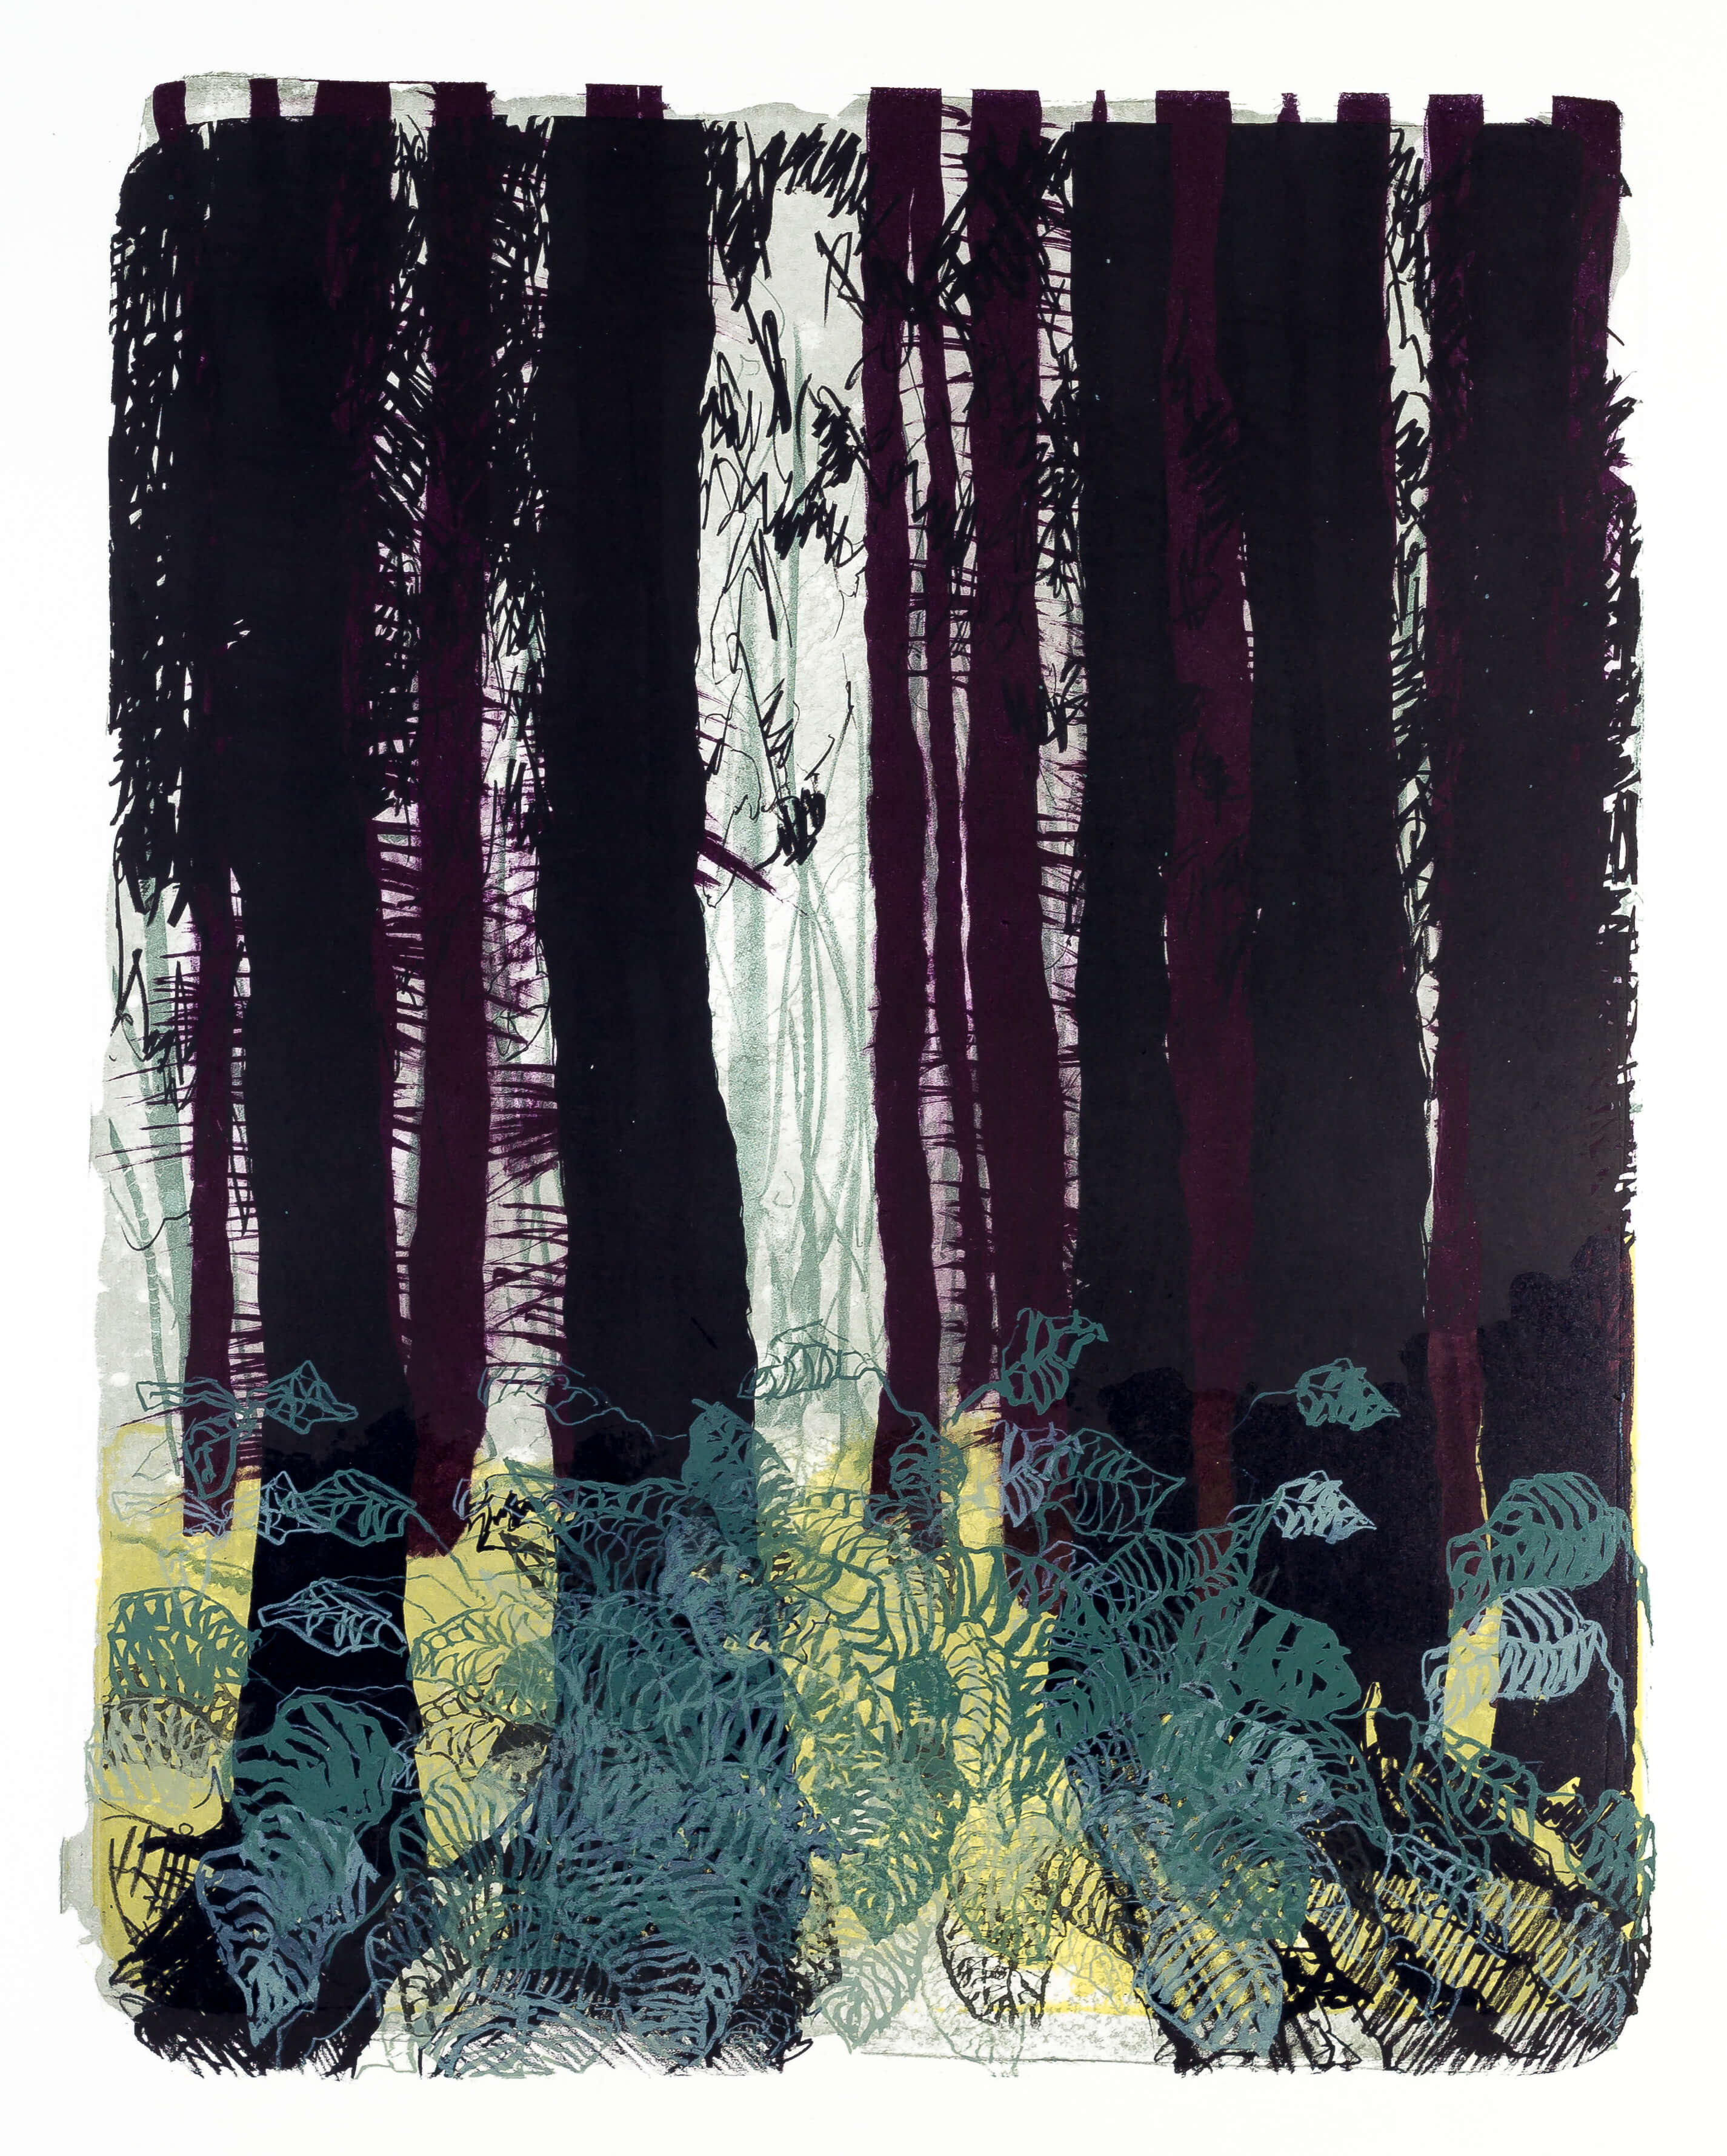 Katharina Albers, Wald X-I, 2015, Farblithographie, Unikat, 50×40 cm